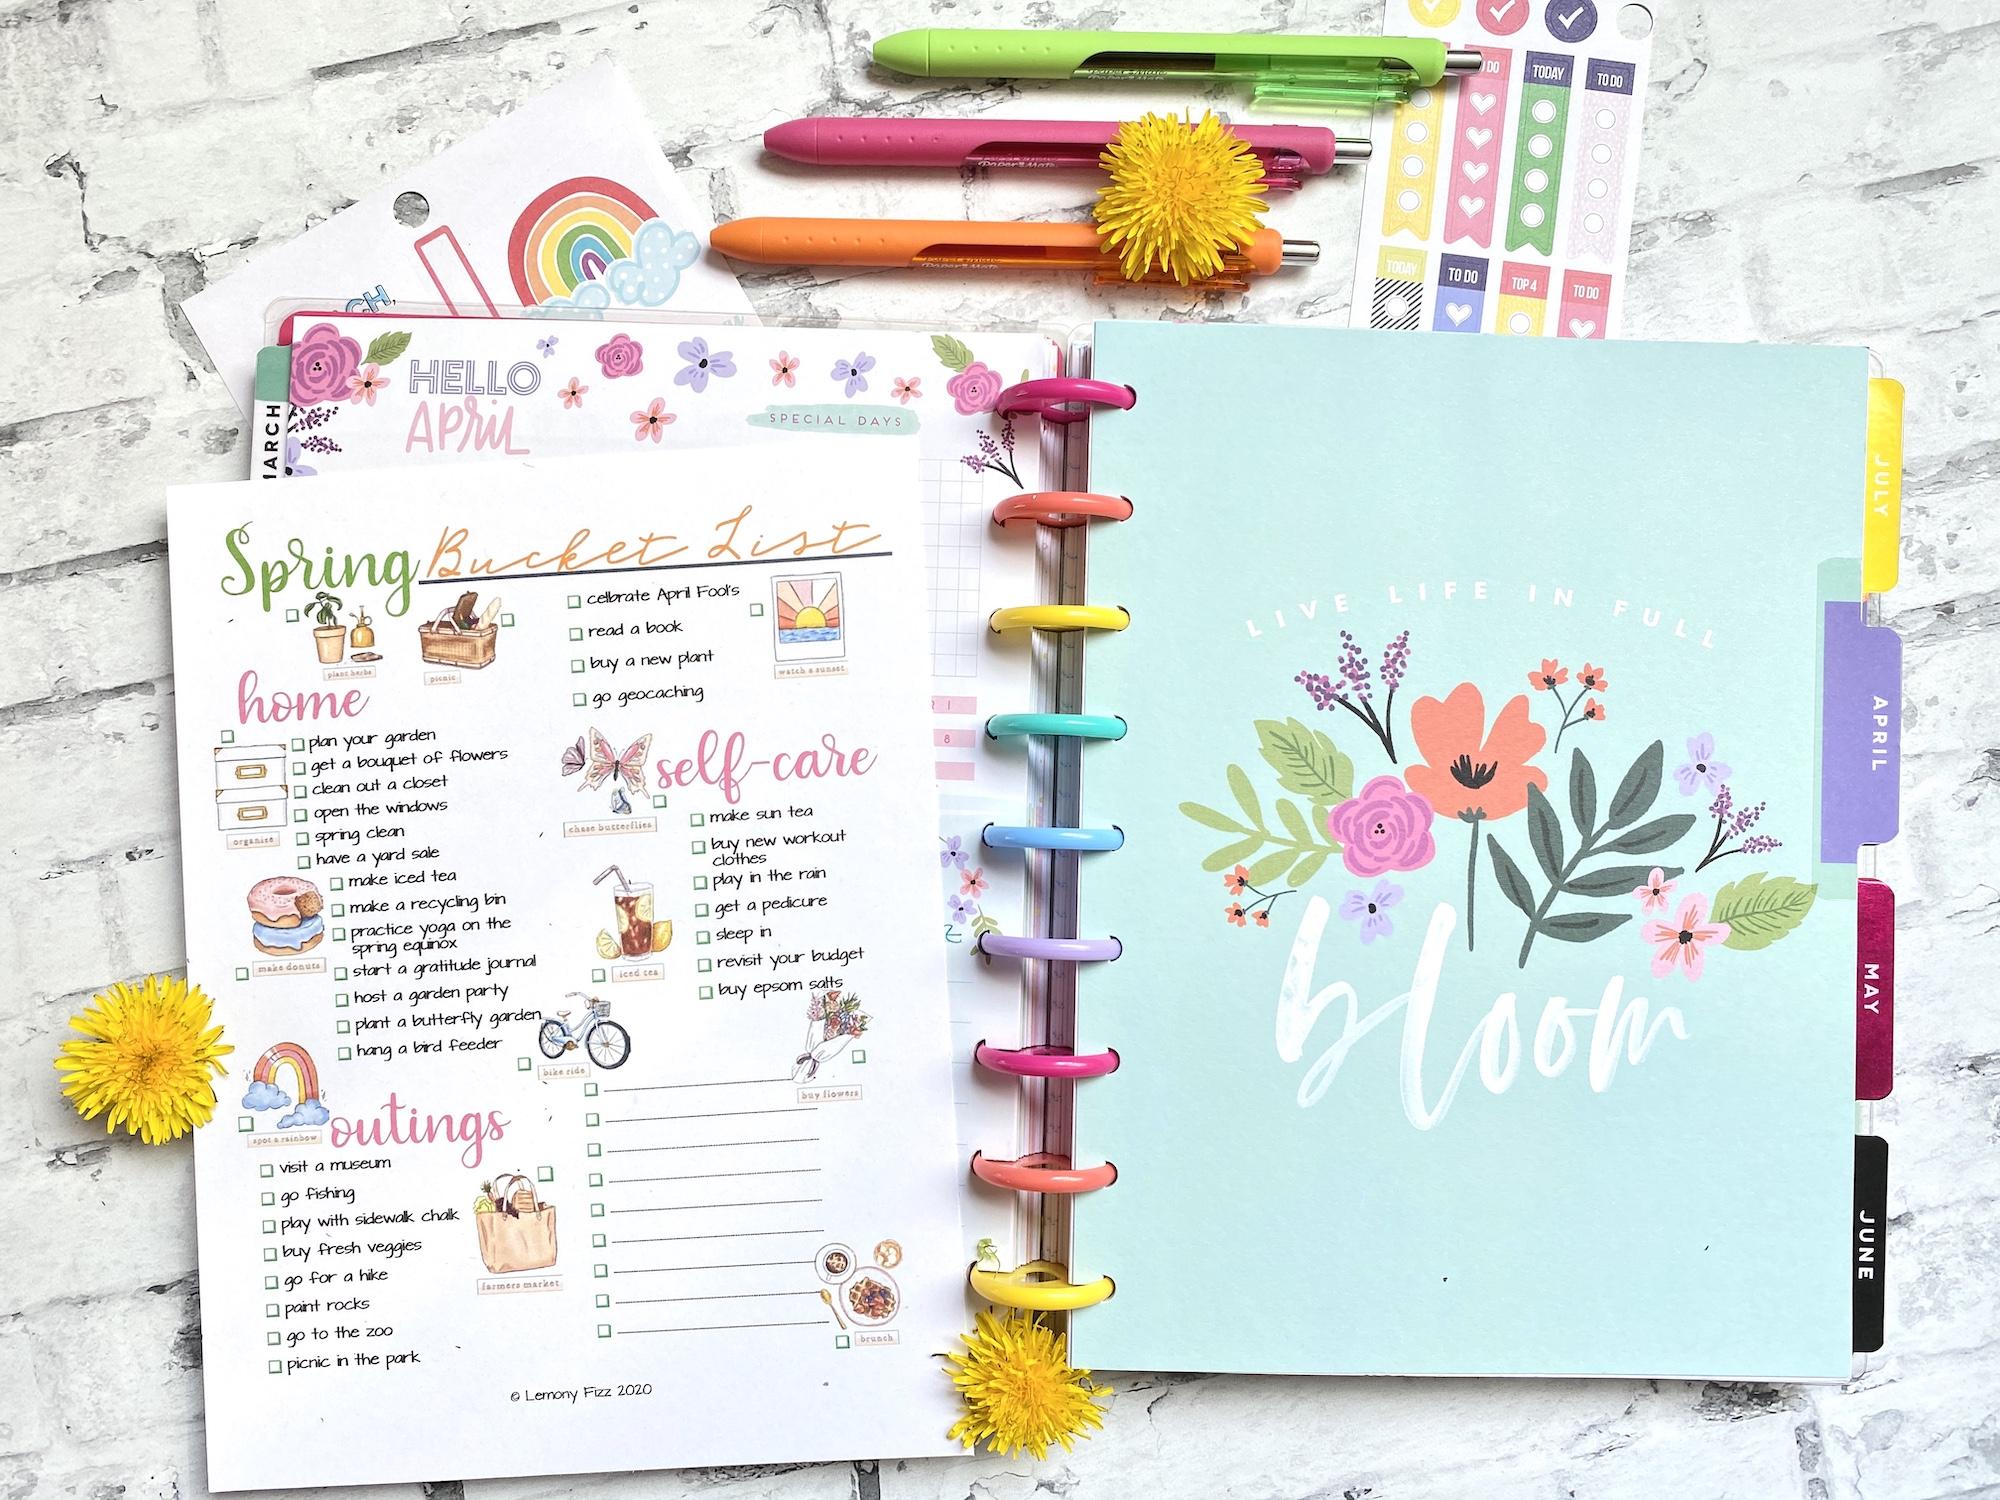 spring-bucket-list-small